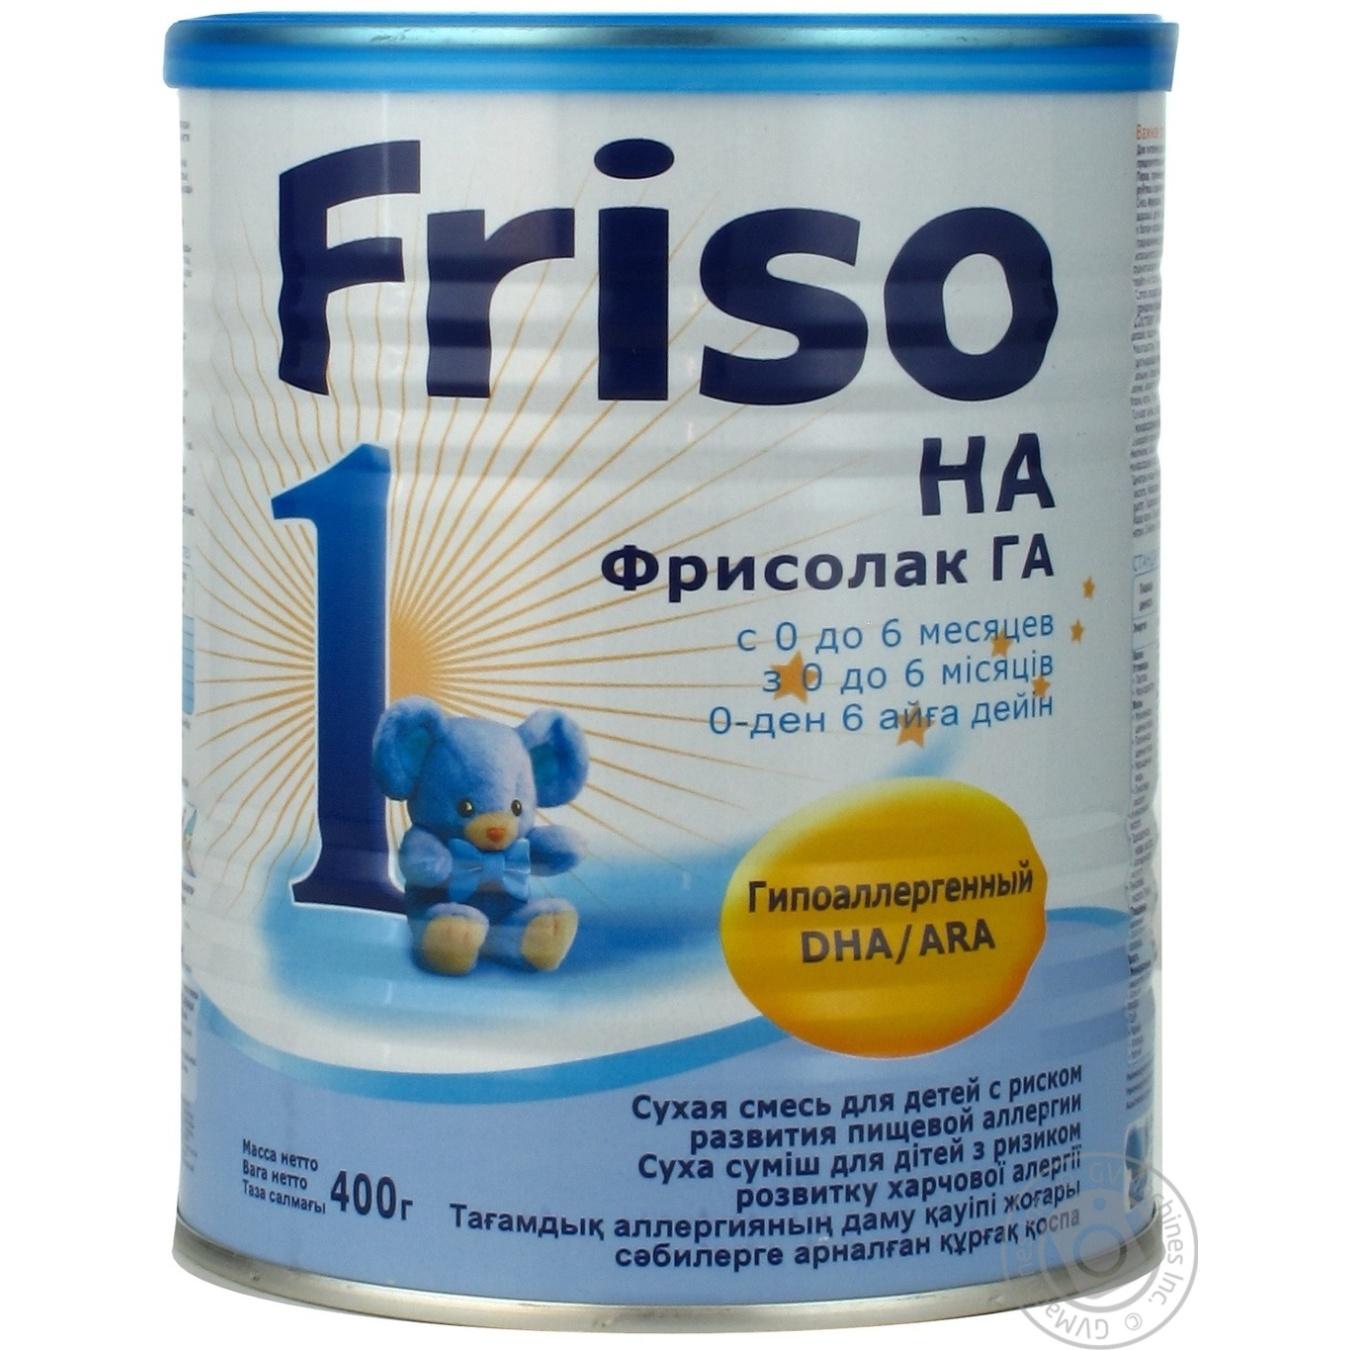 Mix Frisolak: reviews of doctors. Hypoallergenic Frisolac: reviews 73